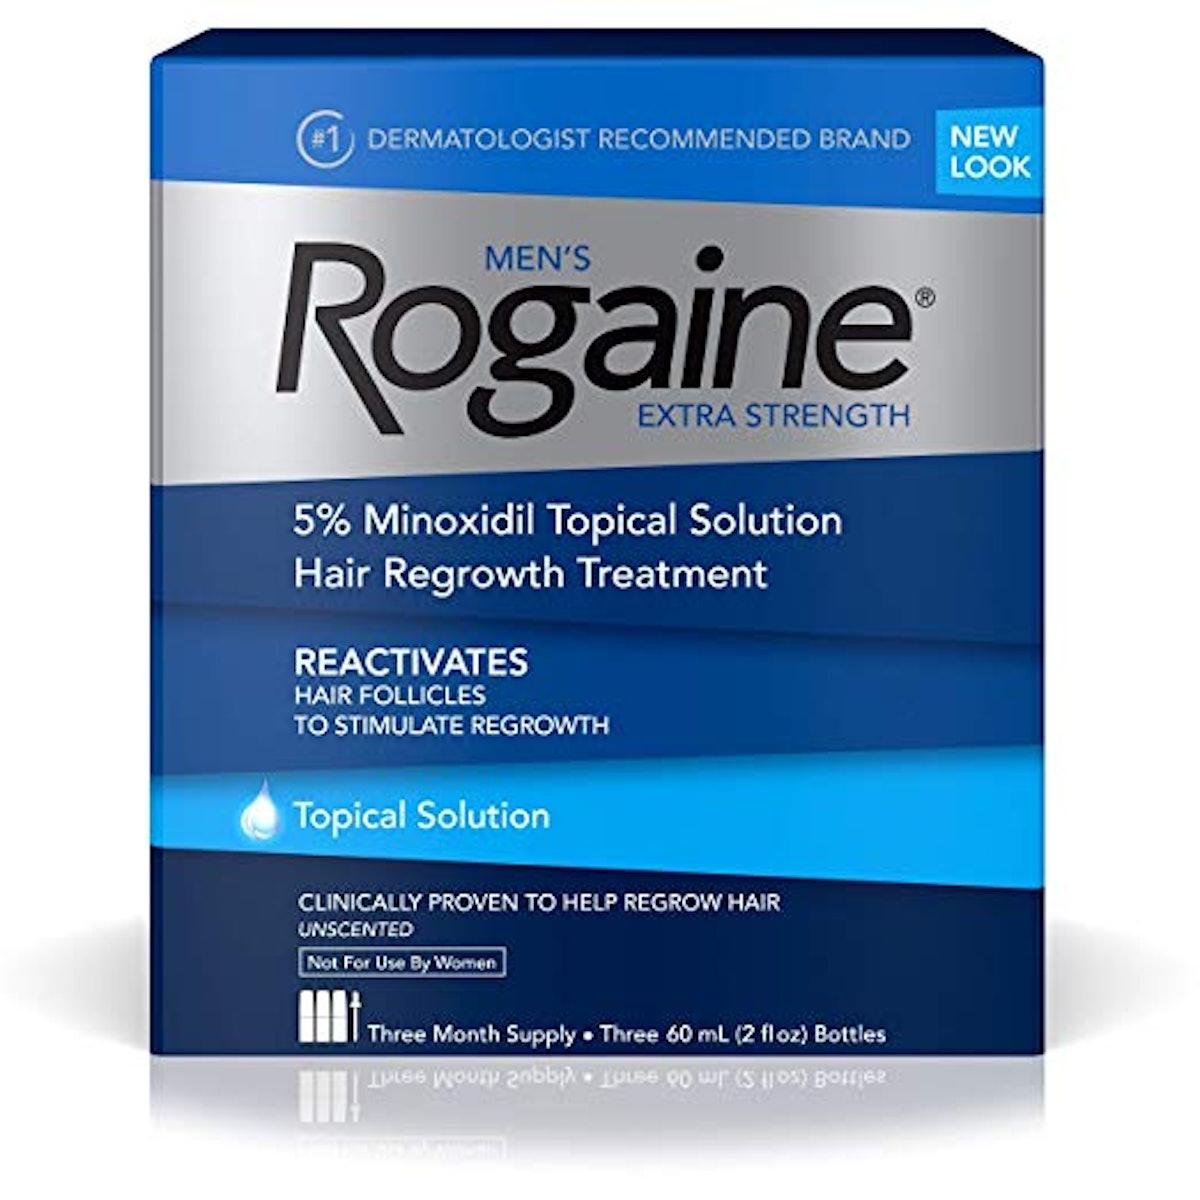 Men's Rogaine 5% Minoxidil Topical Solution